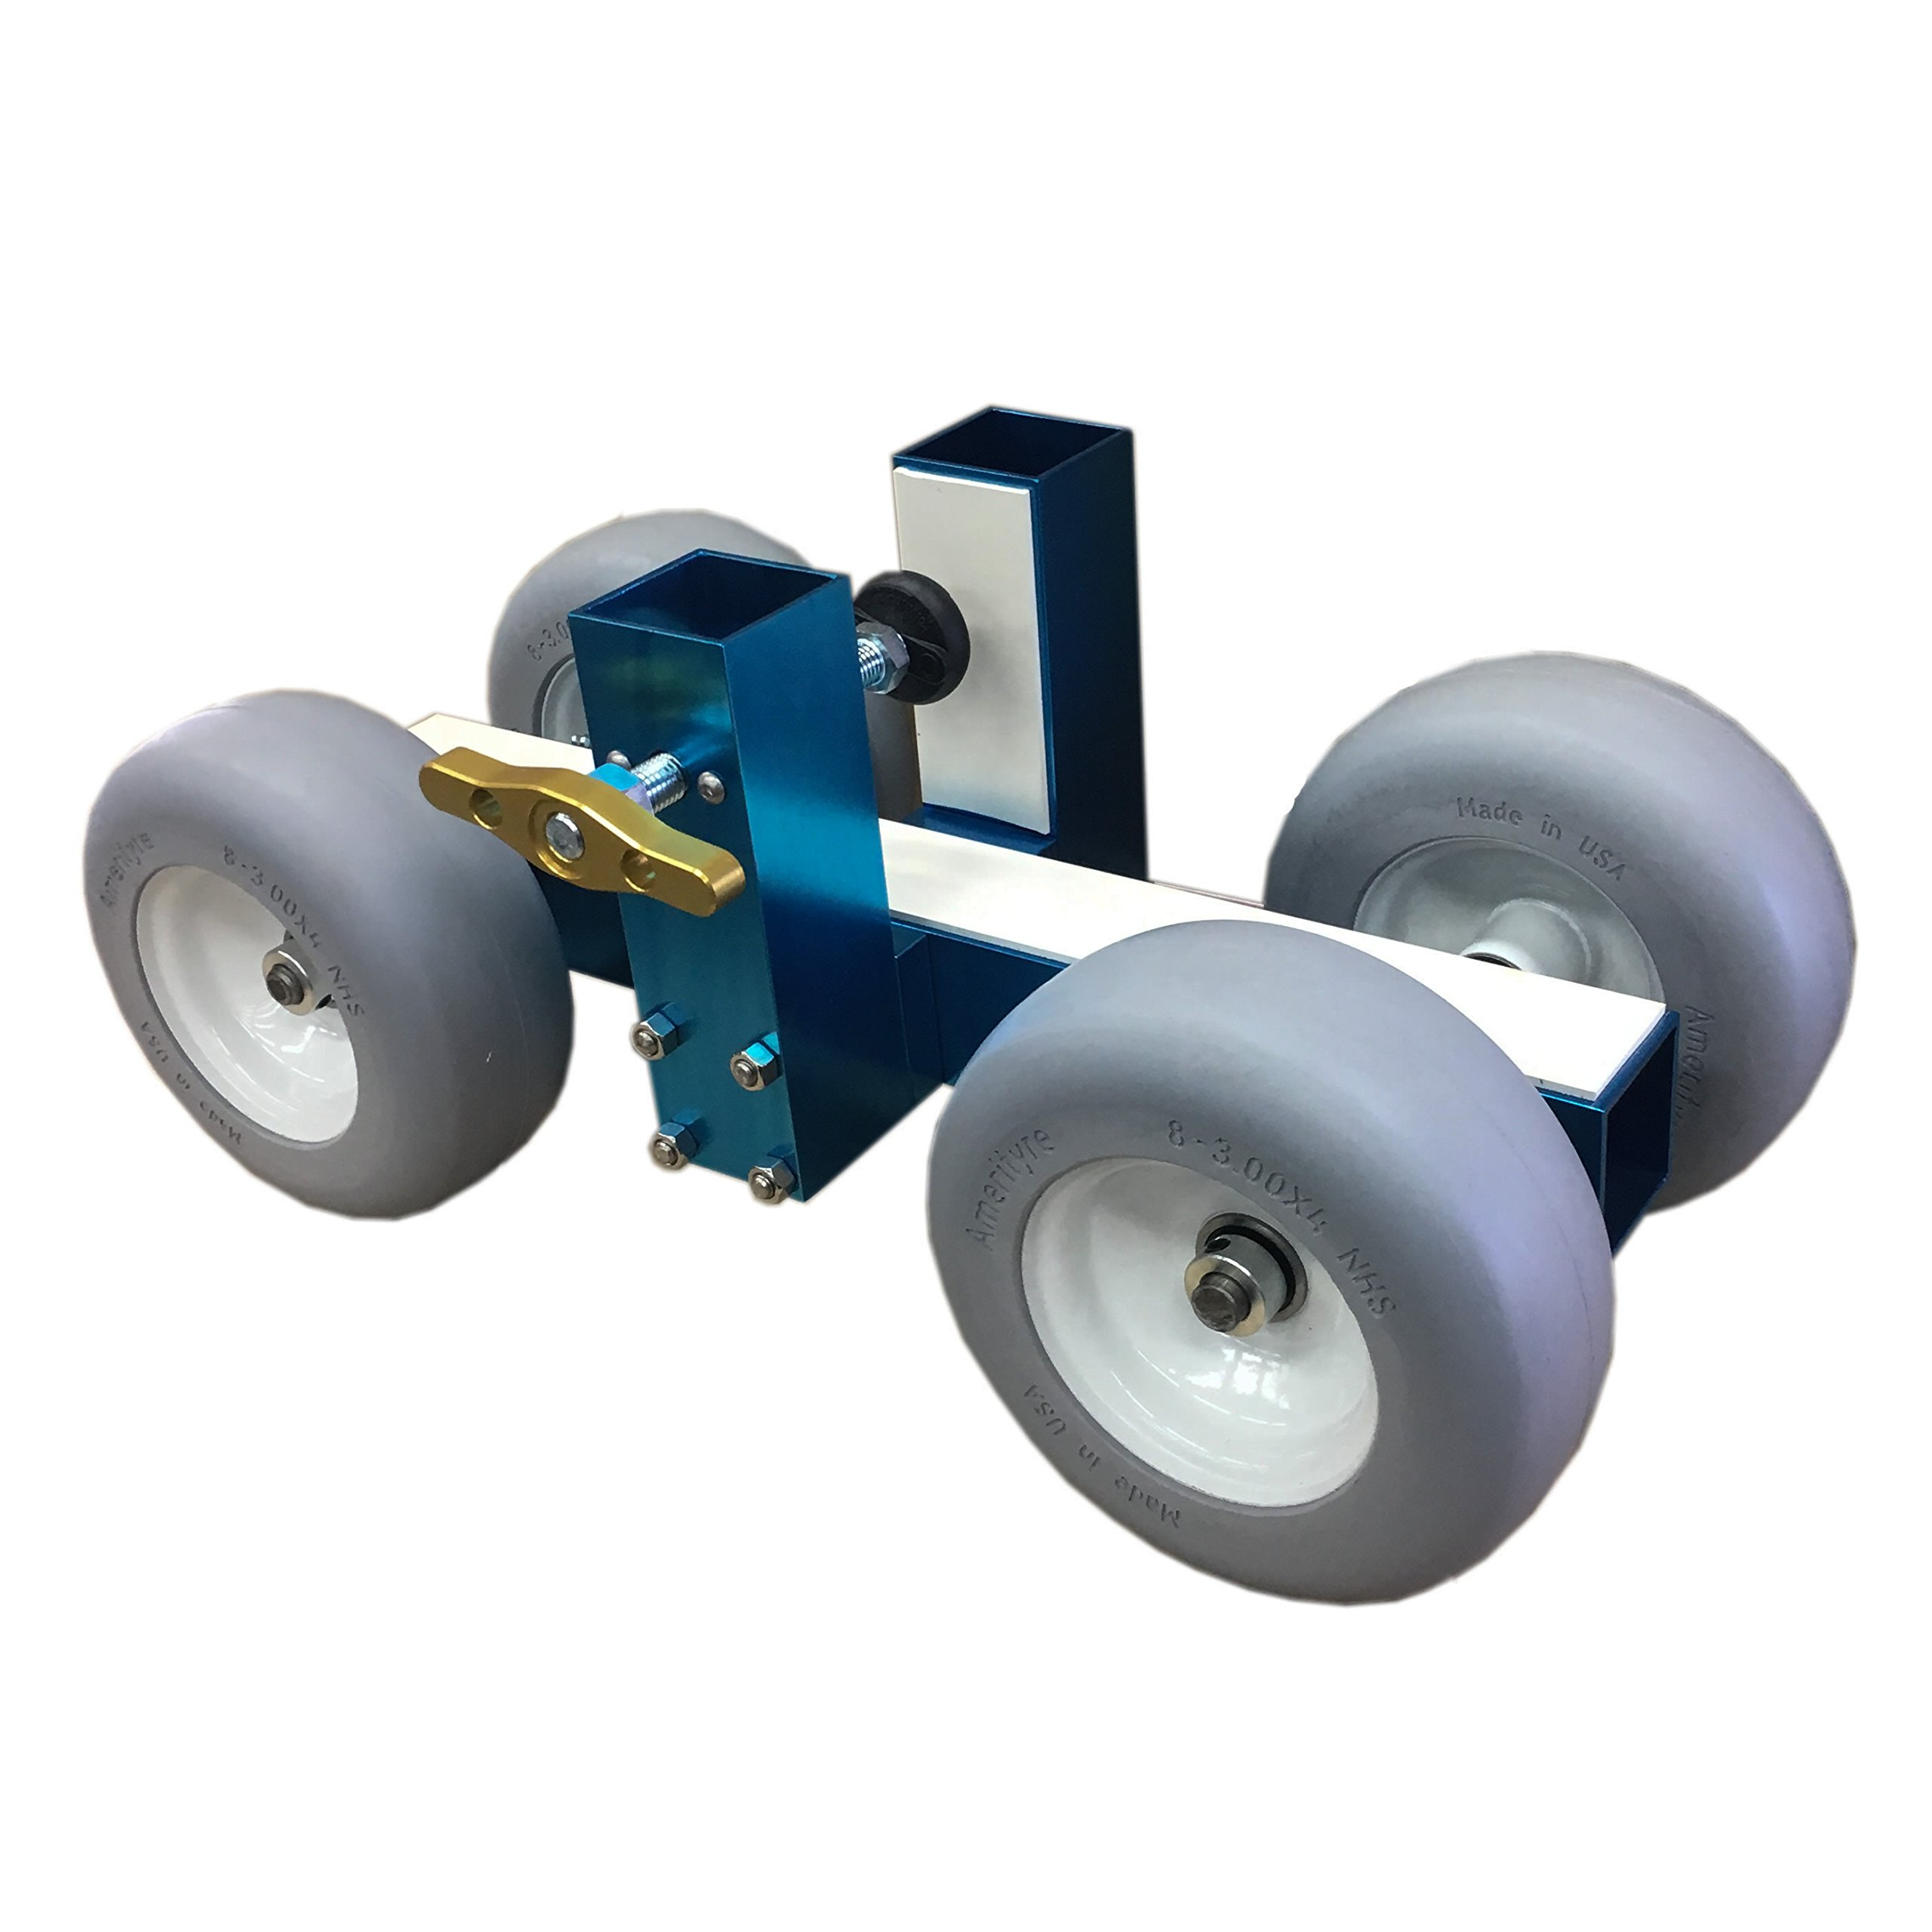 Pro-Dolly TX1 Granite Stone Slab Dolly Pro Cart by Blue Thunder